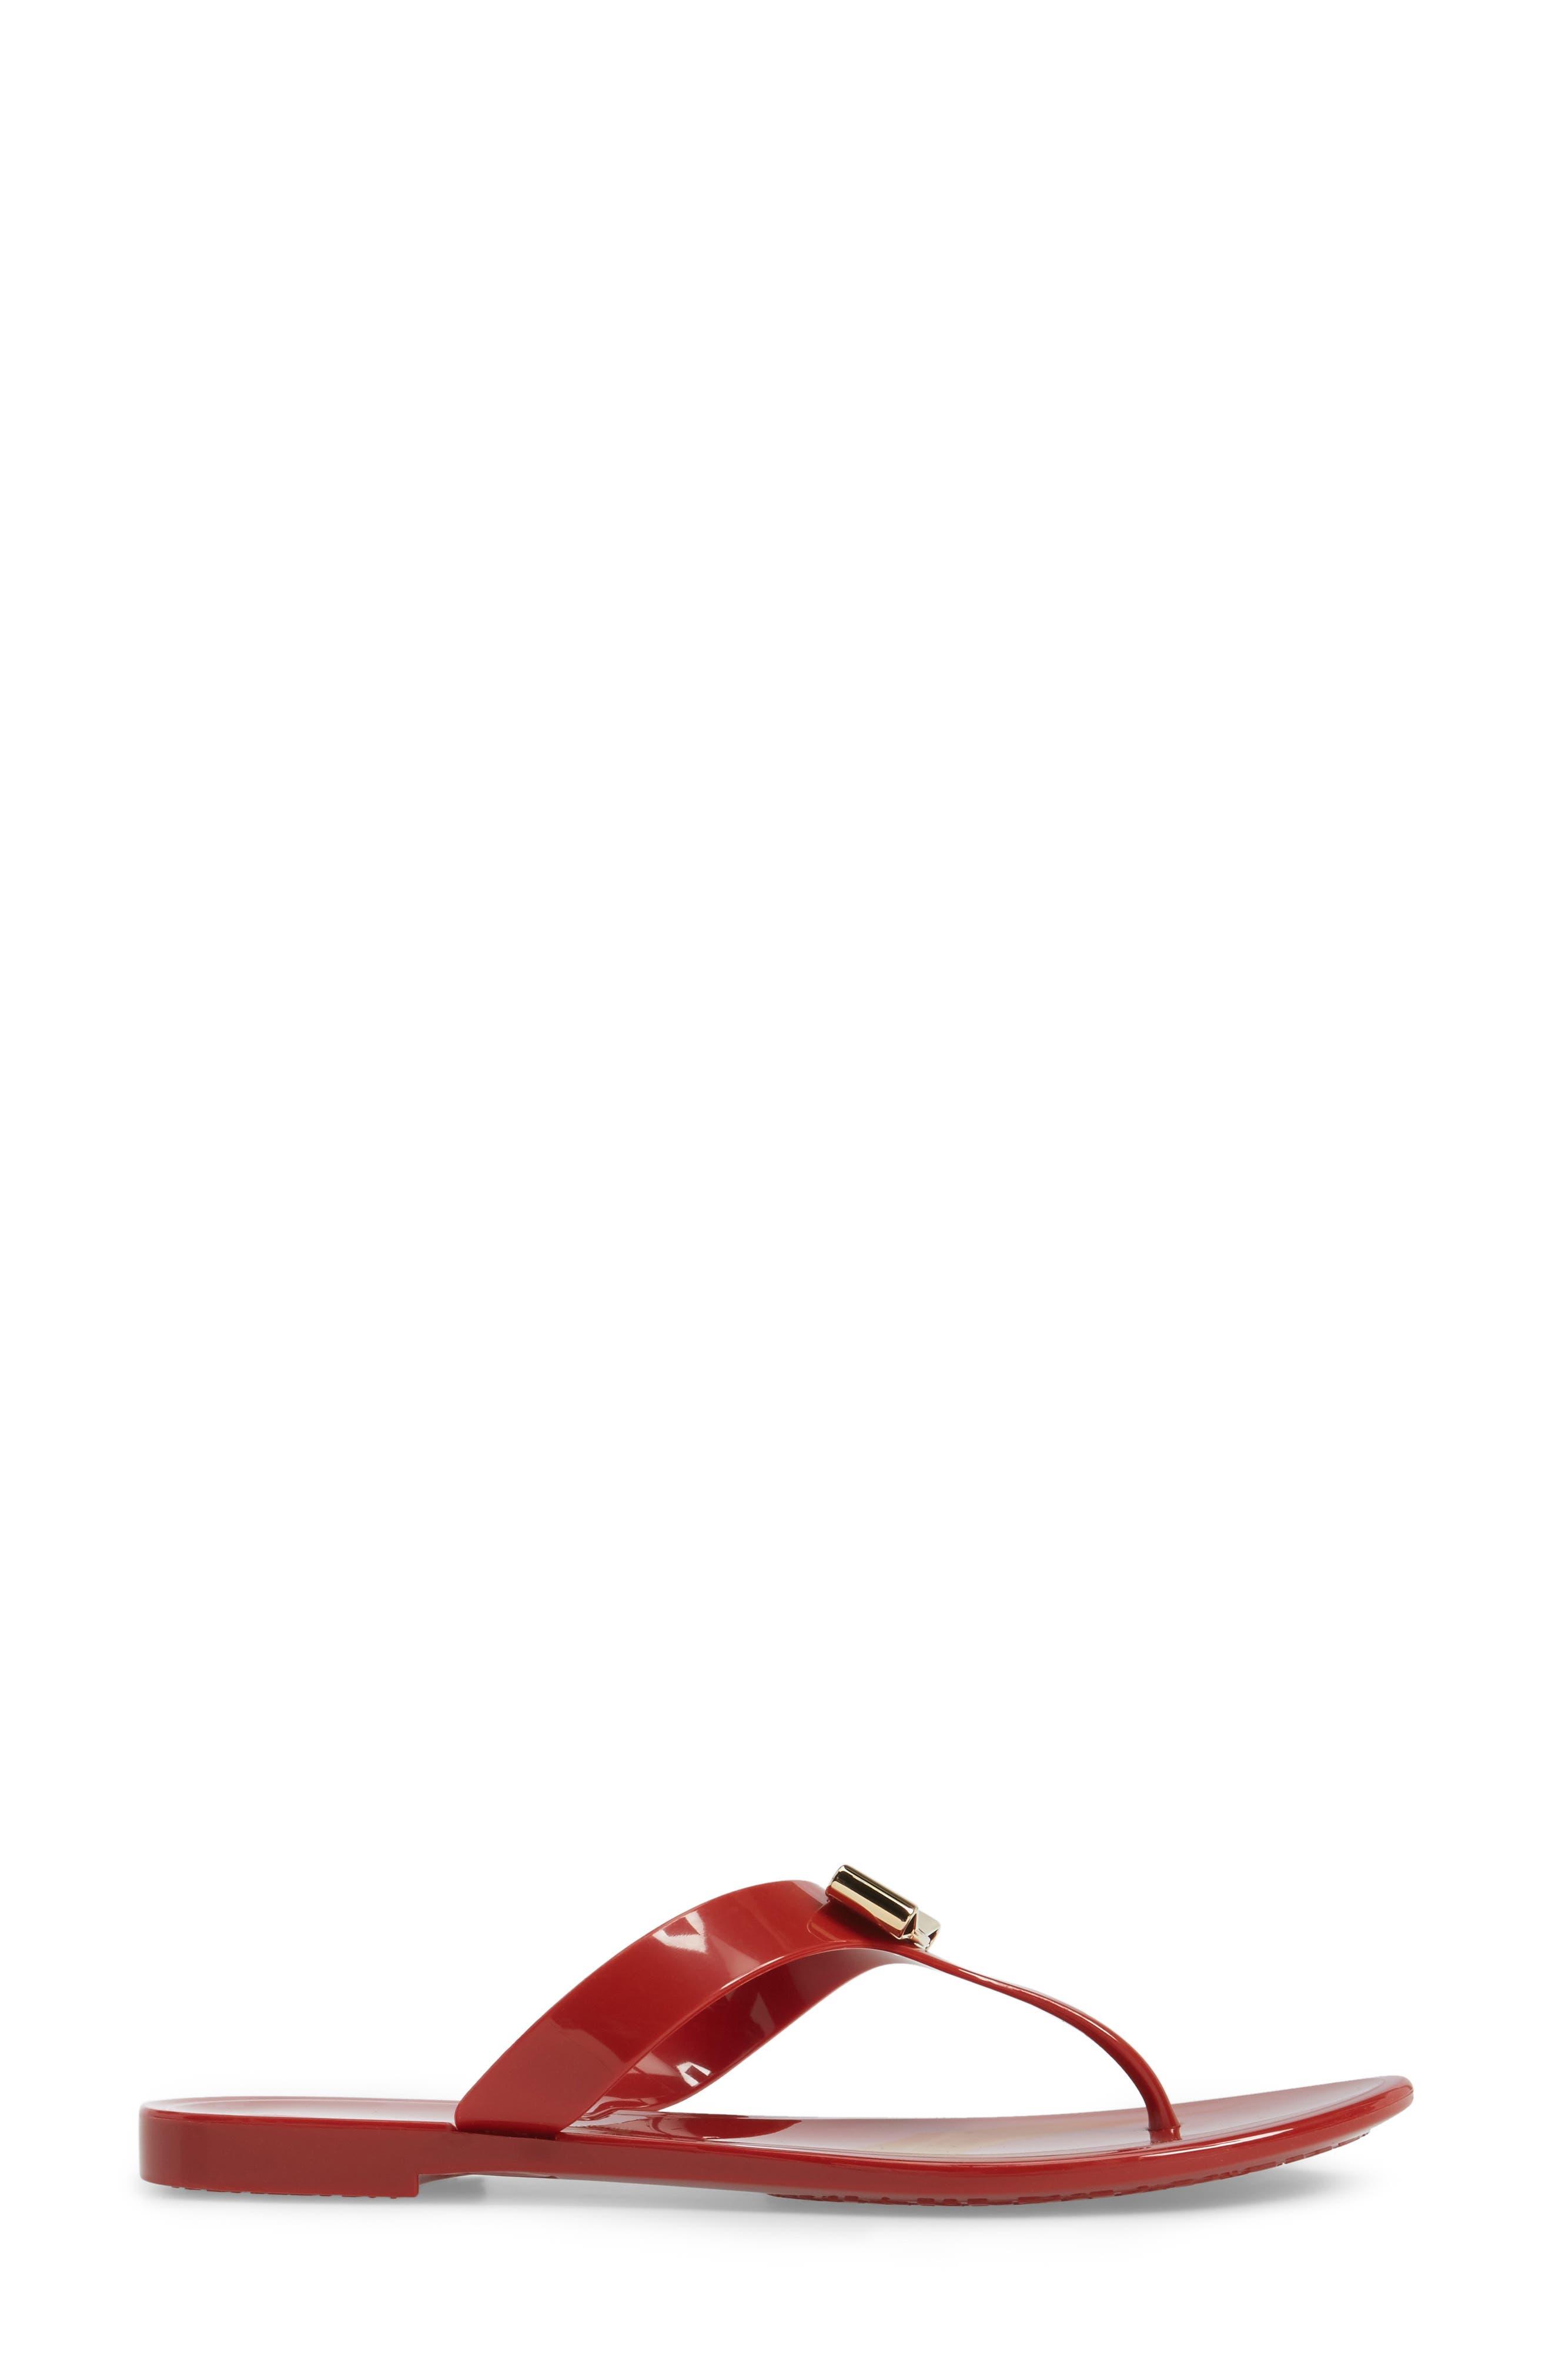 Farelia Jelly Flat Bow Sandal,                             Alternate thumbnail 3, color,                             Red Pvc